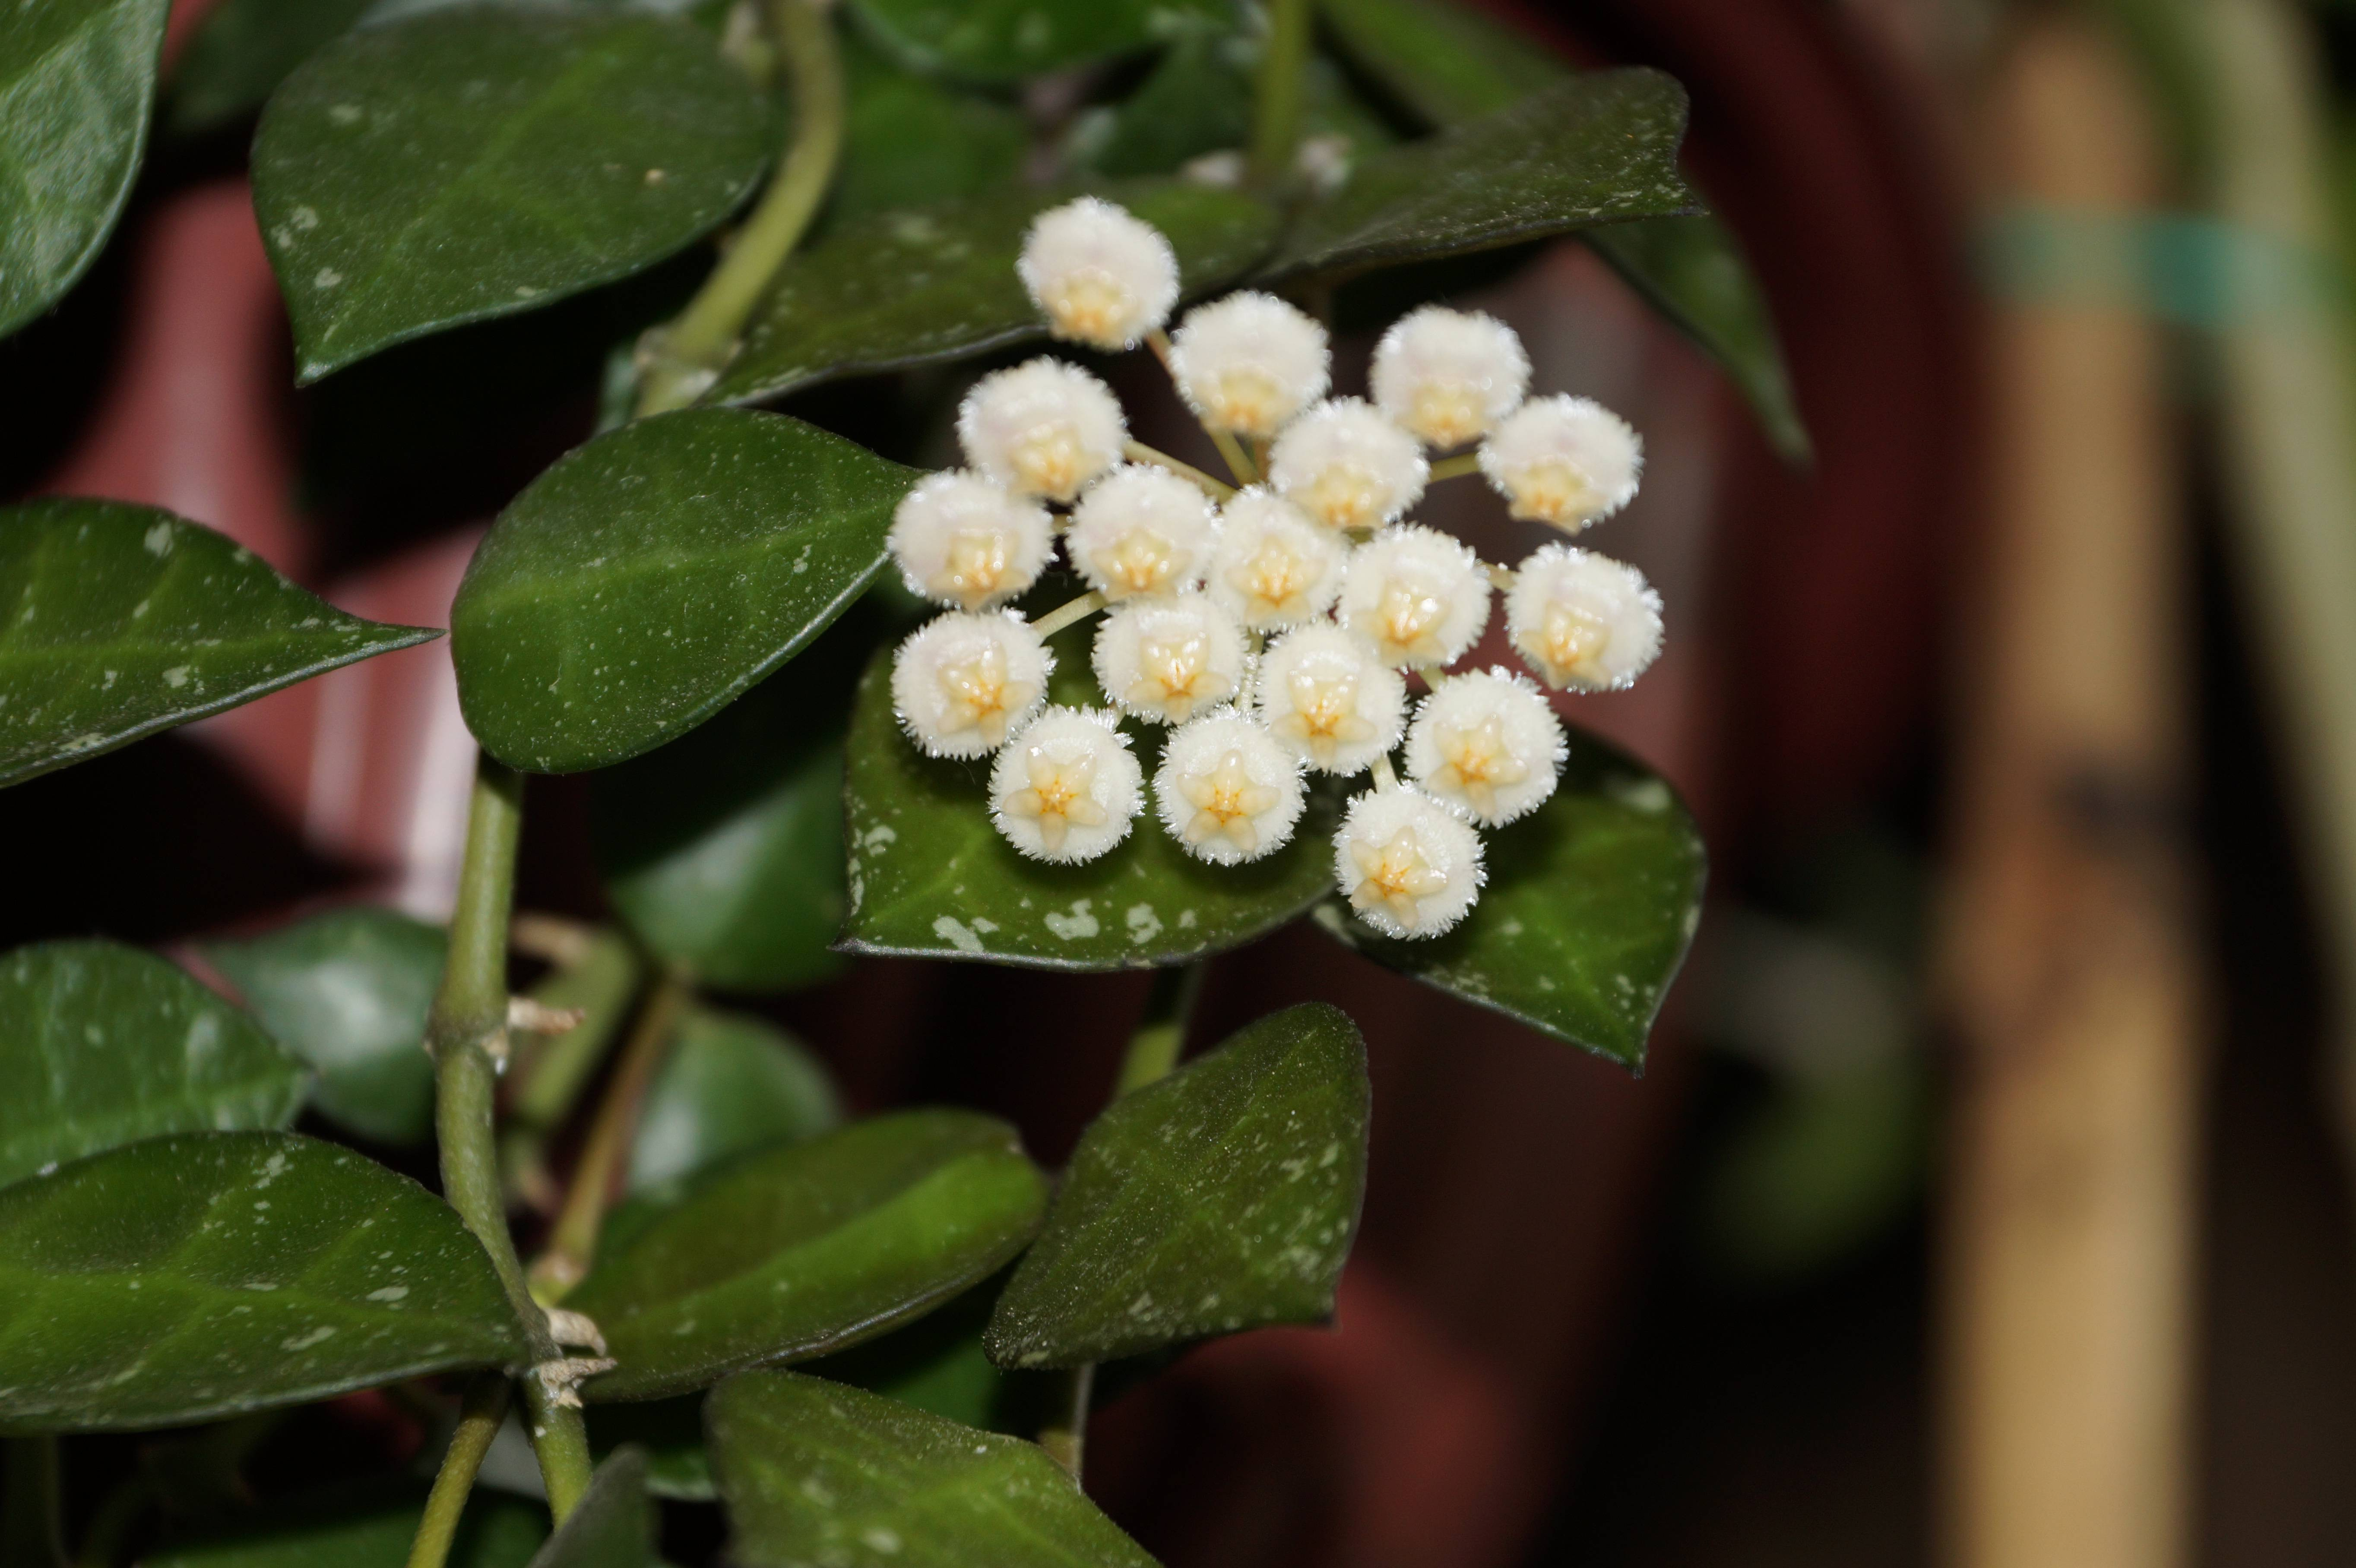 Хойя мультифлора: уход в домашних условия, цветение, фото